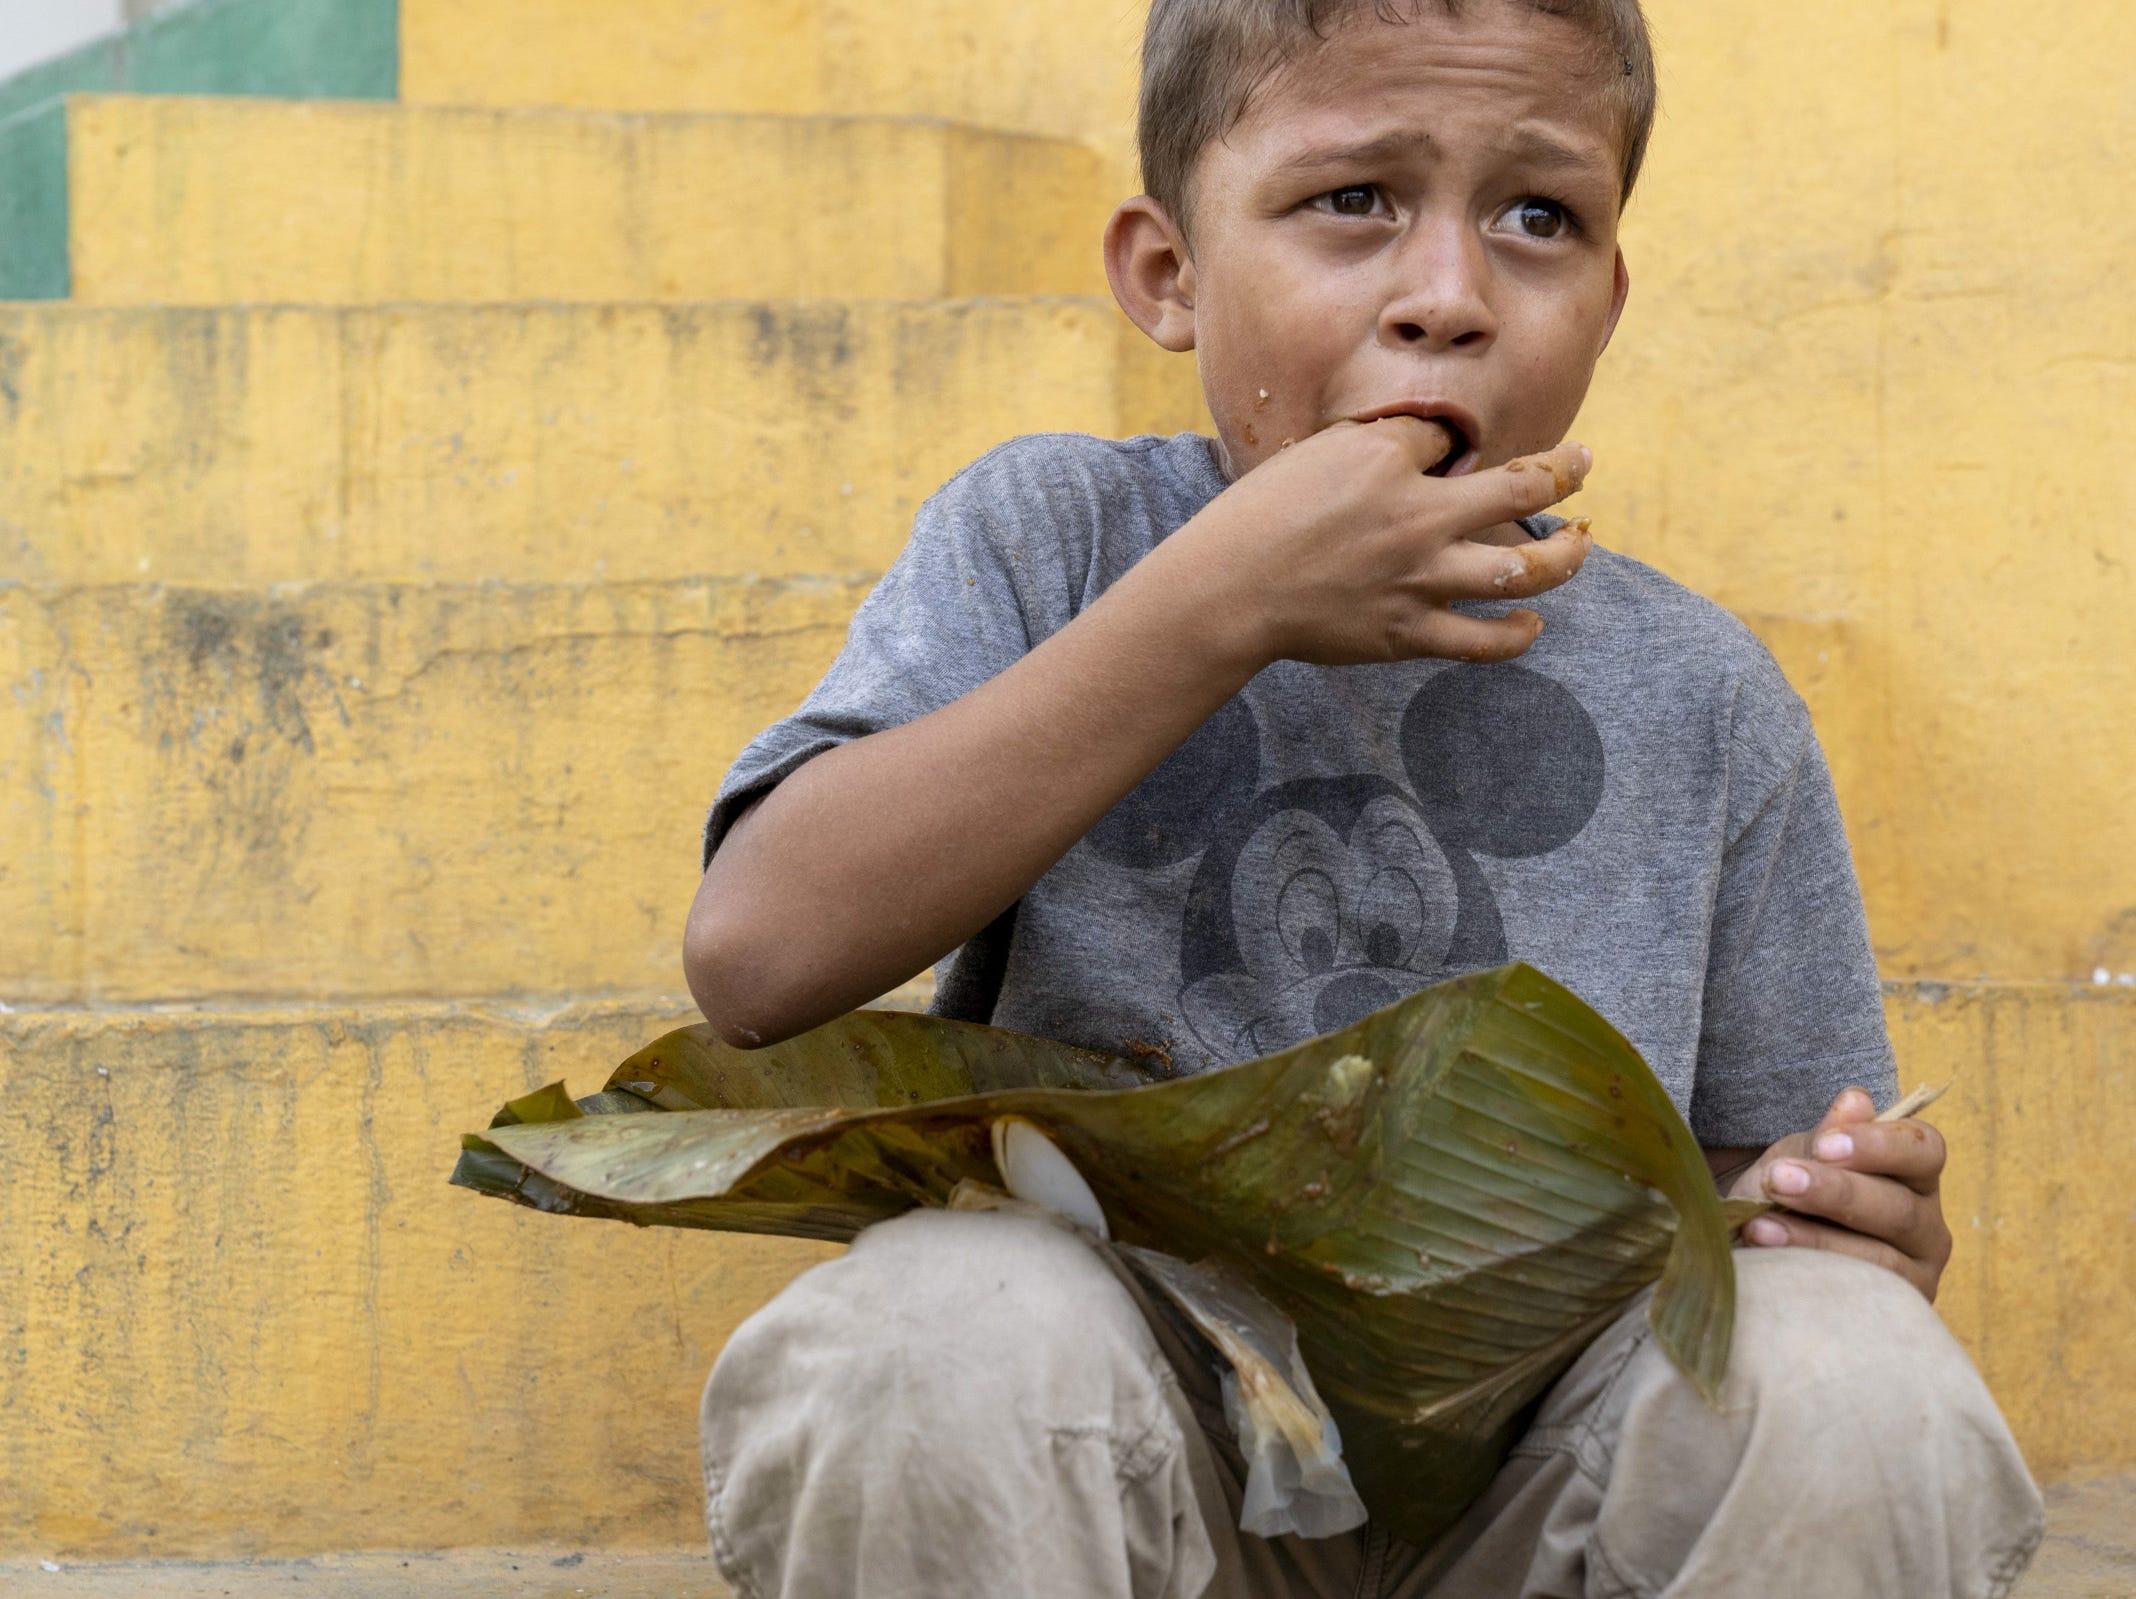 Gerson de Jesus Zelaya, 6, from Honduras, has a donated lunch near a park in Tecun Uman, Guatemala.